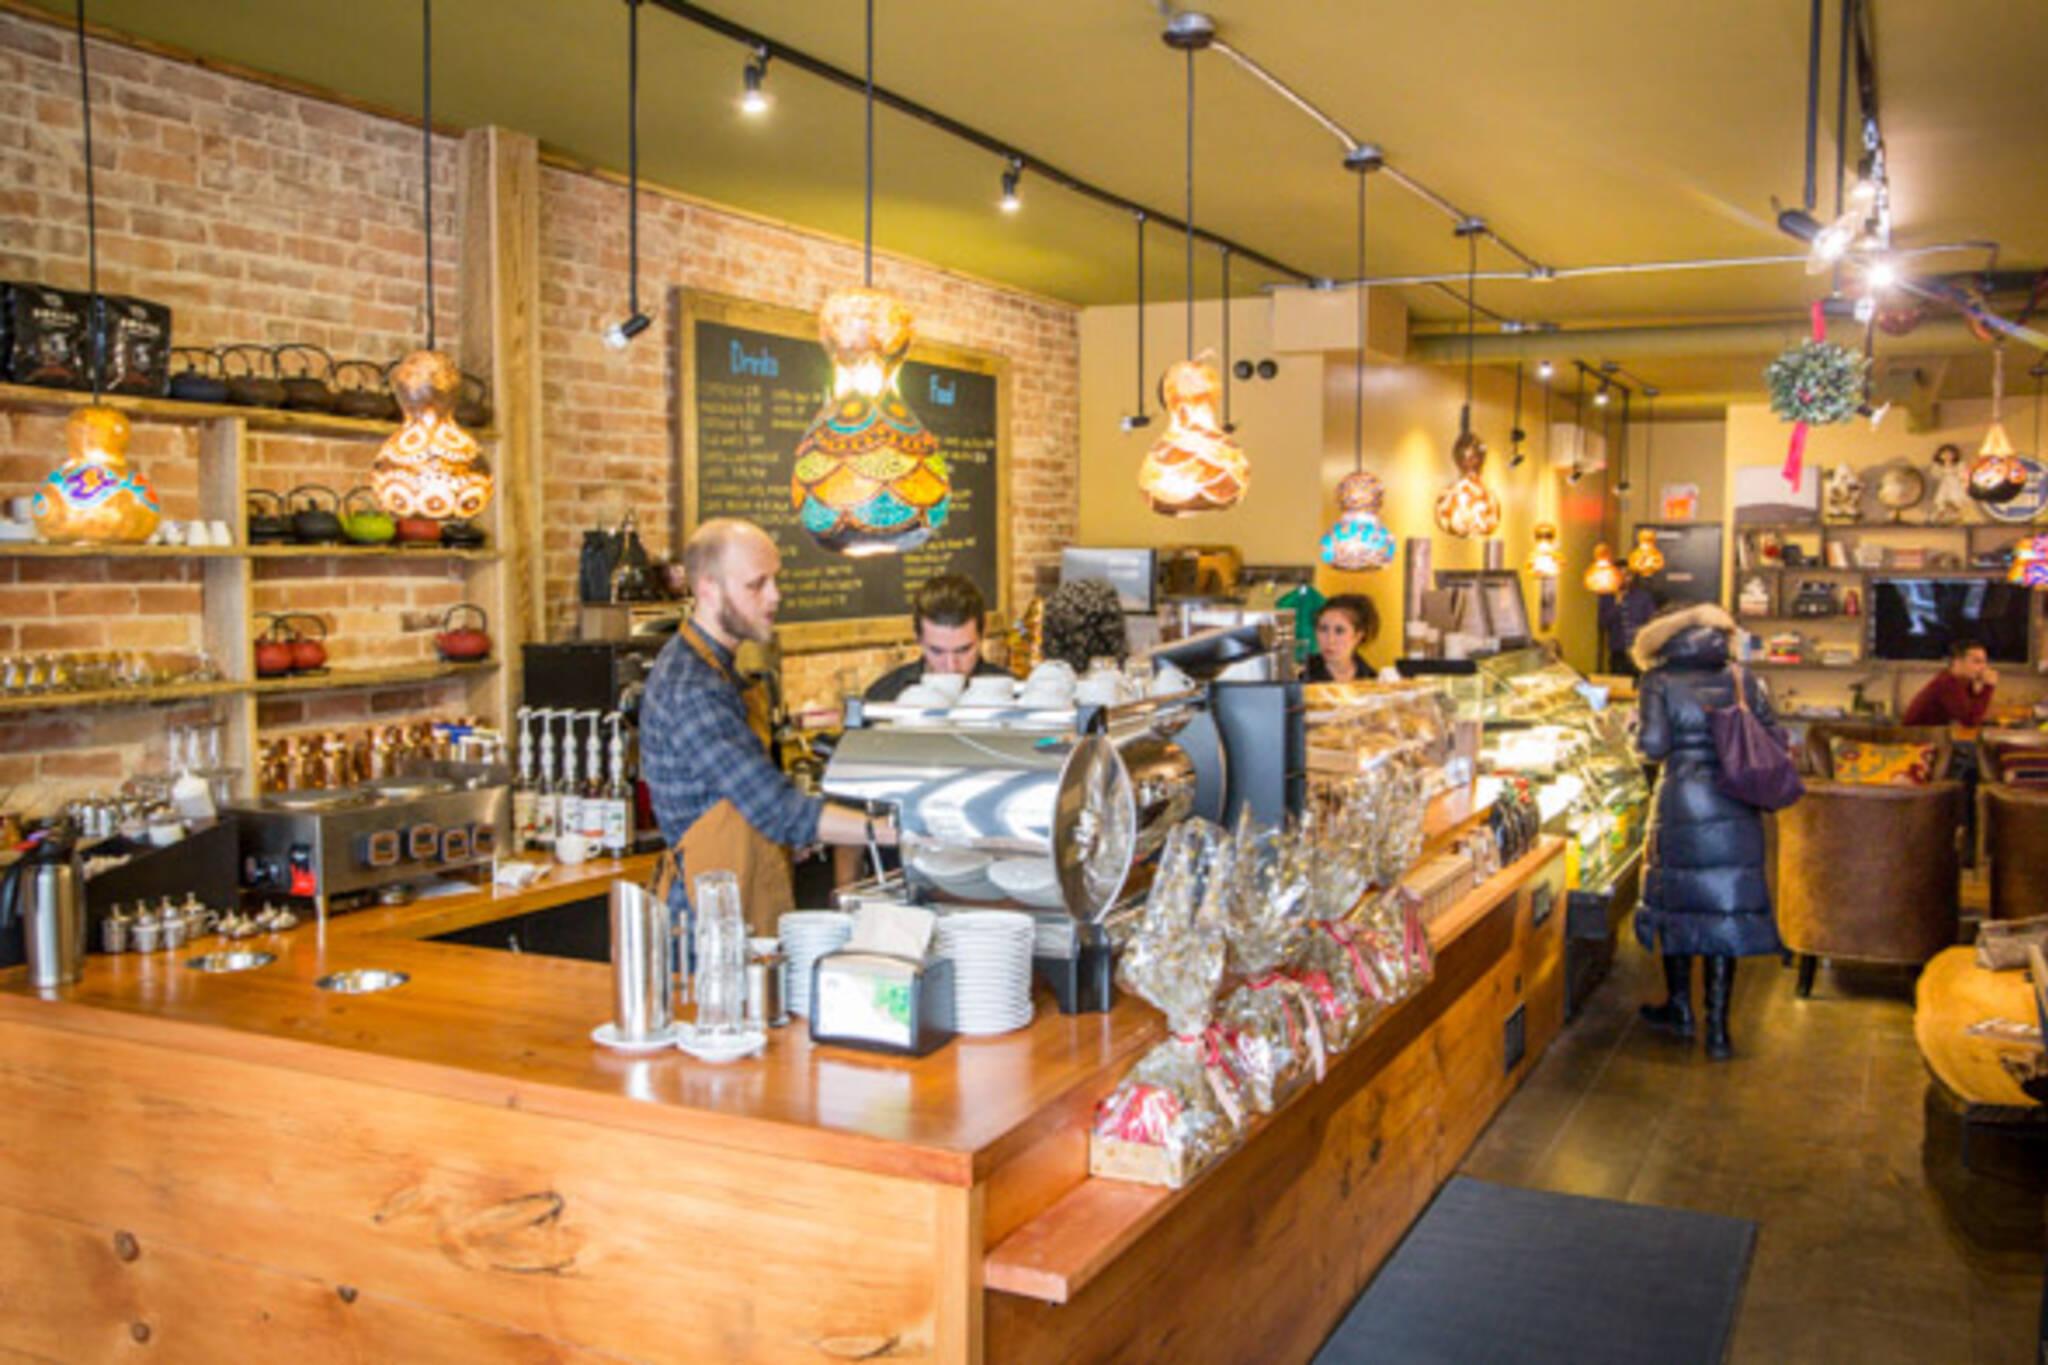 istanbul cafe toronto